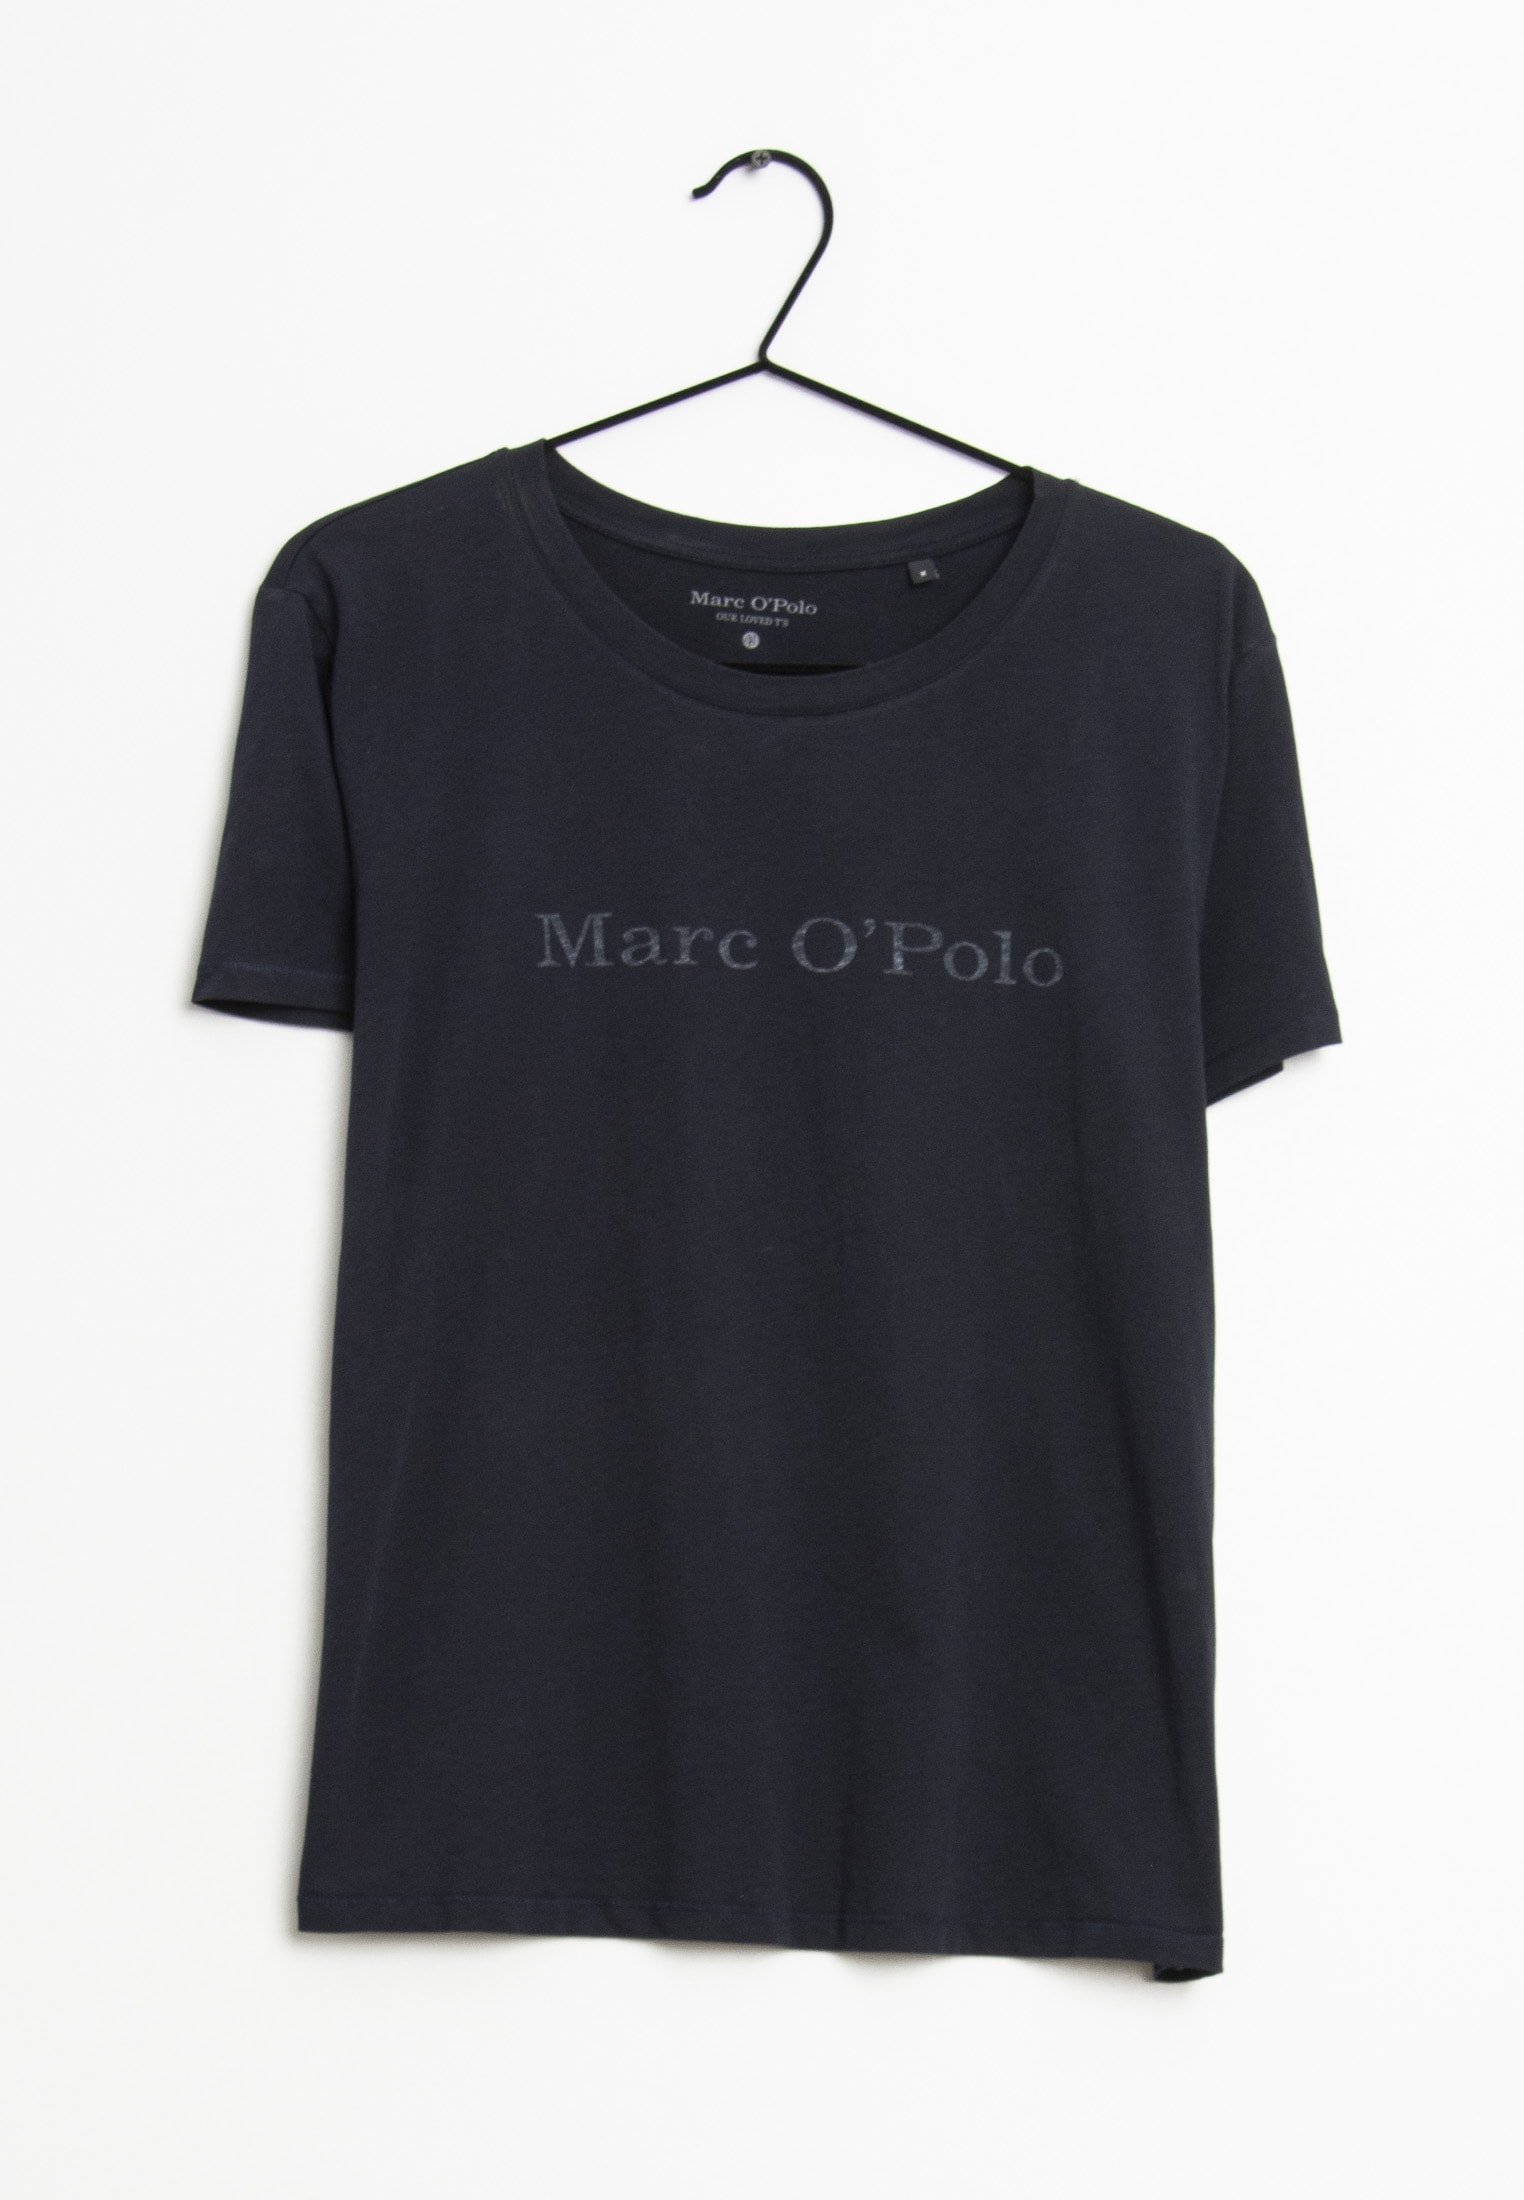 Marc O'Polo T-Shirt Blau Gr.M